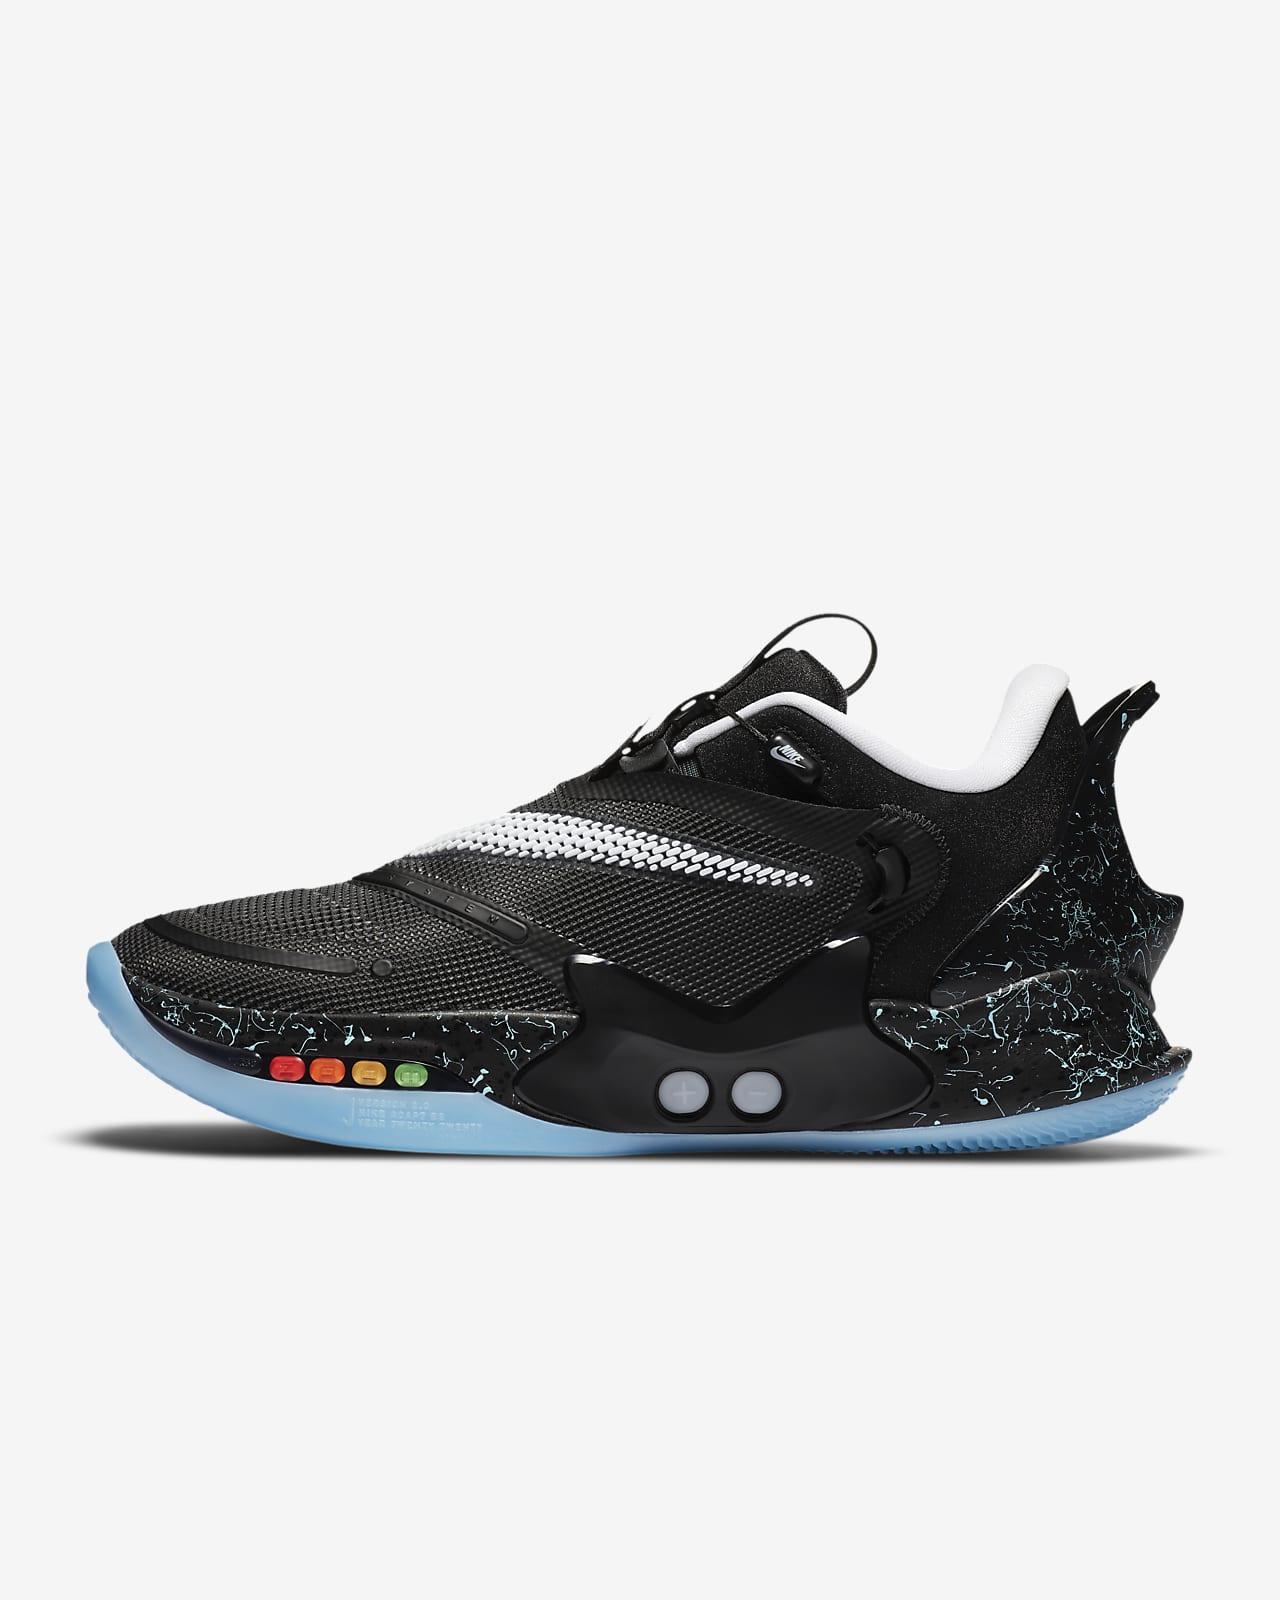 Nike Adapt BB 2.0 Basketball Shoe